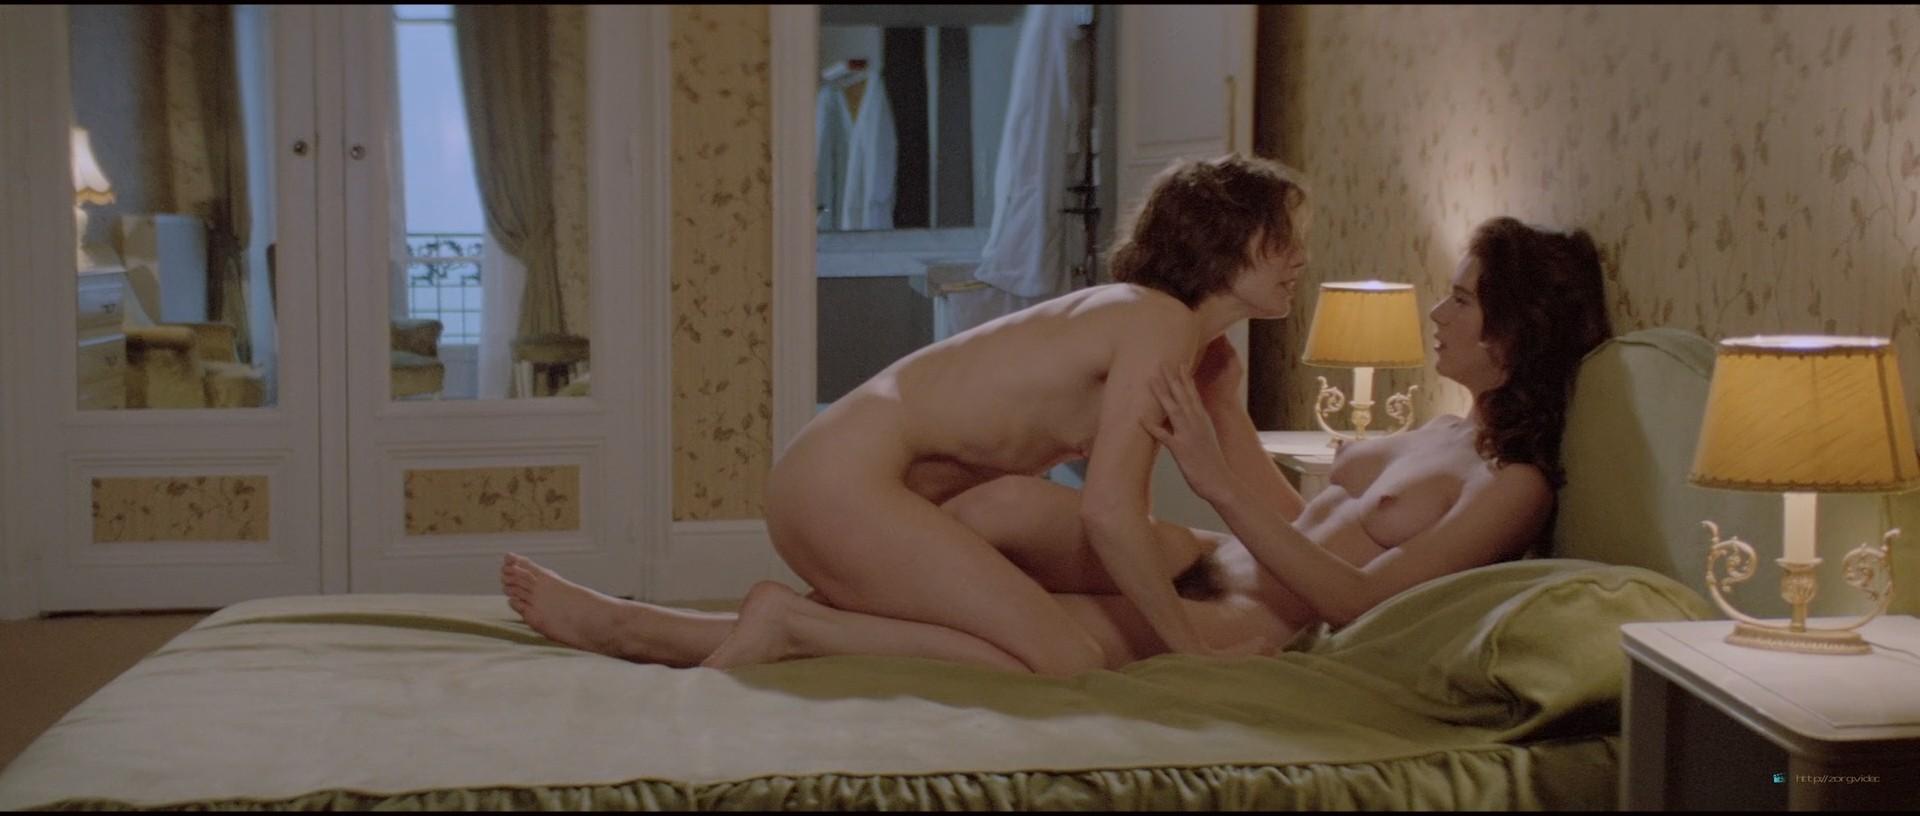 Jane Birkin nude bush Maruschka Detmers nude full frontal - La pirate (FR-1984) HD 1080p BluRay (5)